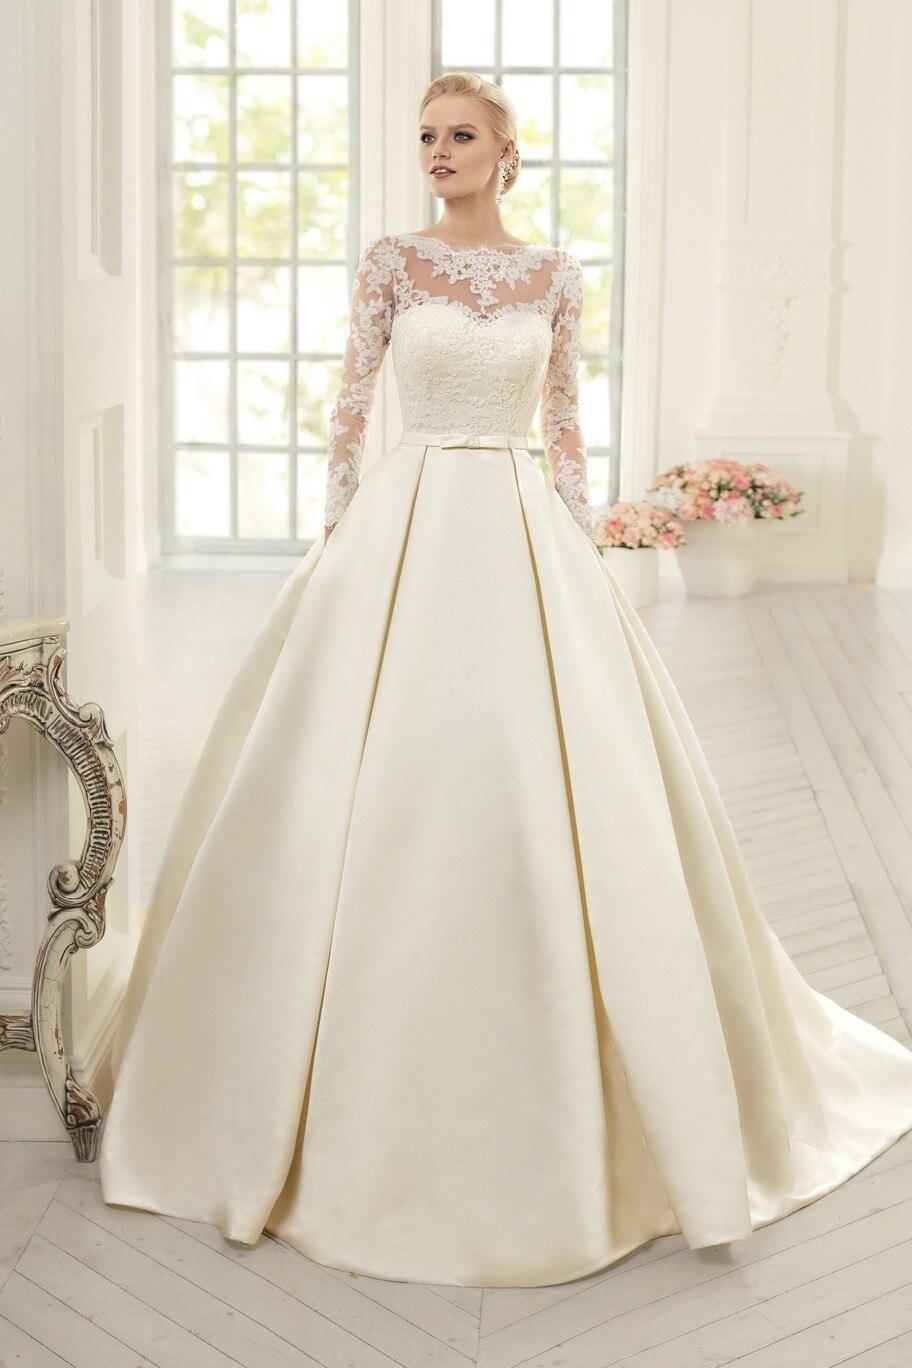 elegant soft satin ball gown wedding dresses 2017 long sleeve wedding dress lace up back vestido